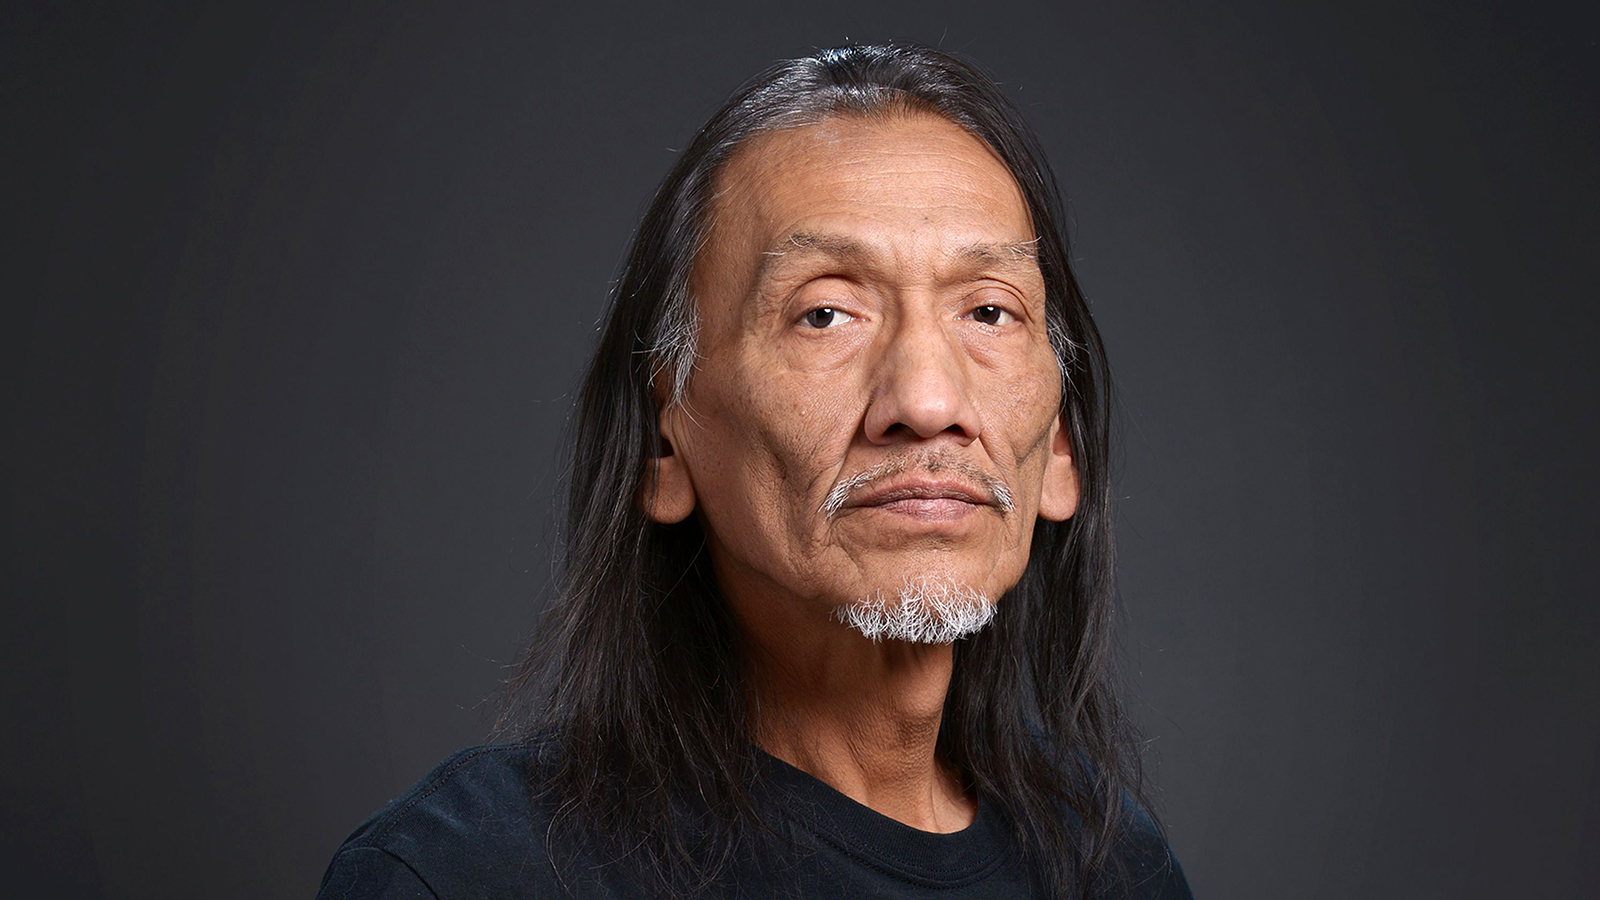 Spiritual but not religious native american gay man